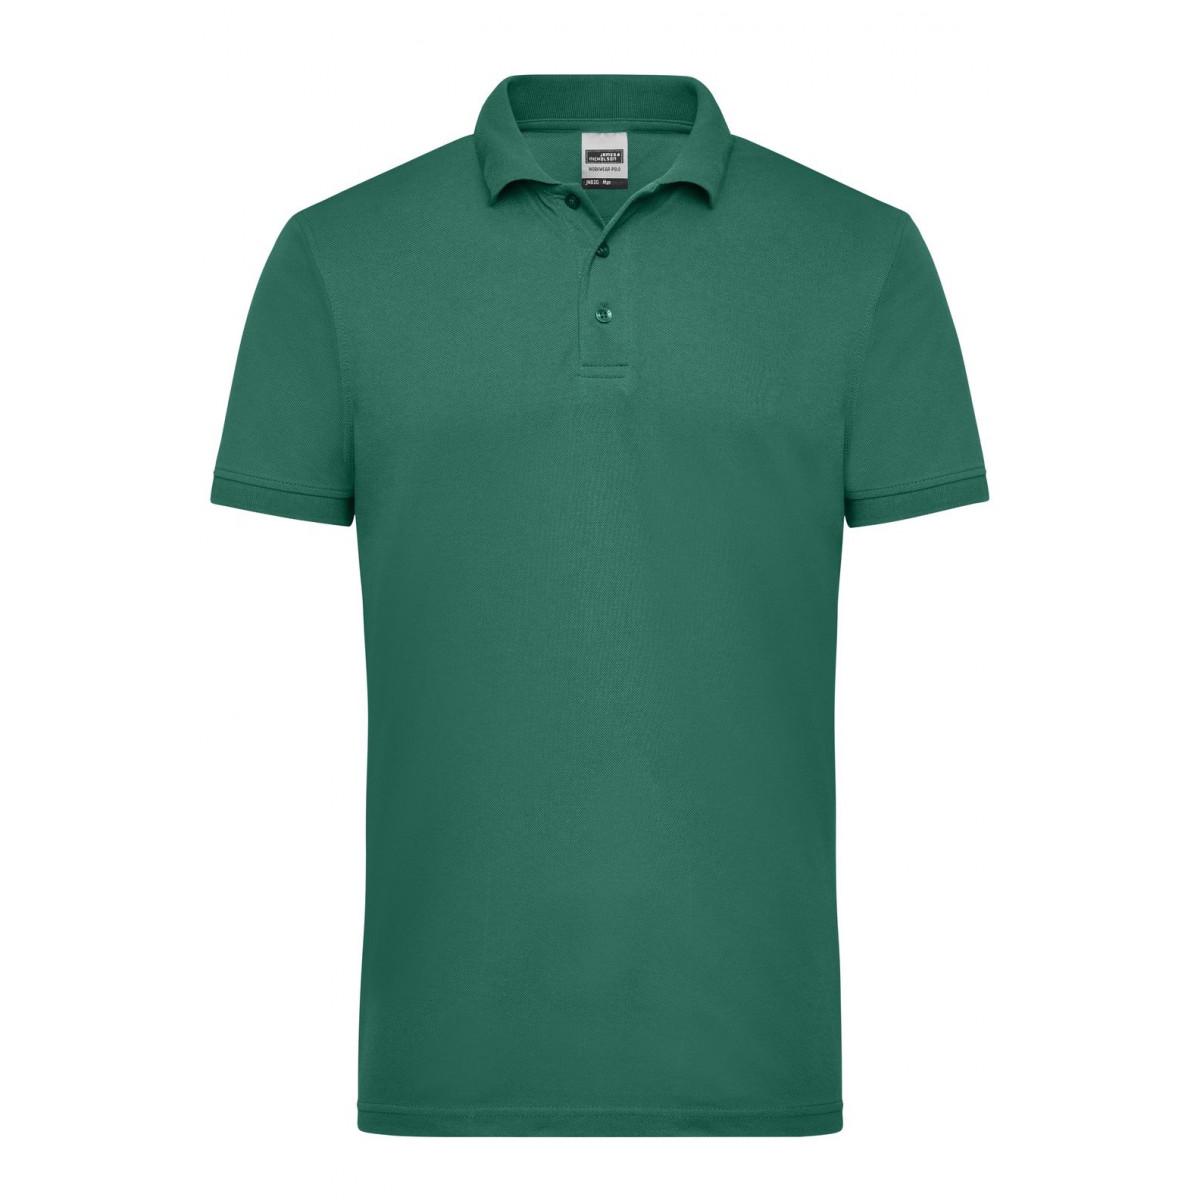 Рубашка поло мужская JN830 Mens Workwear Polo - Темно-зеленый